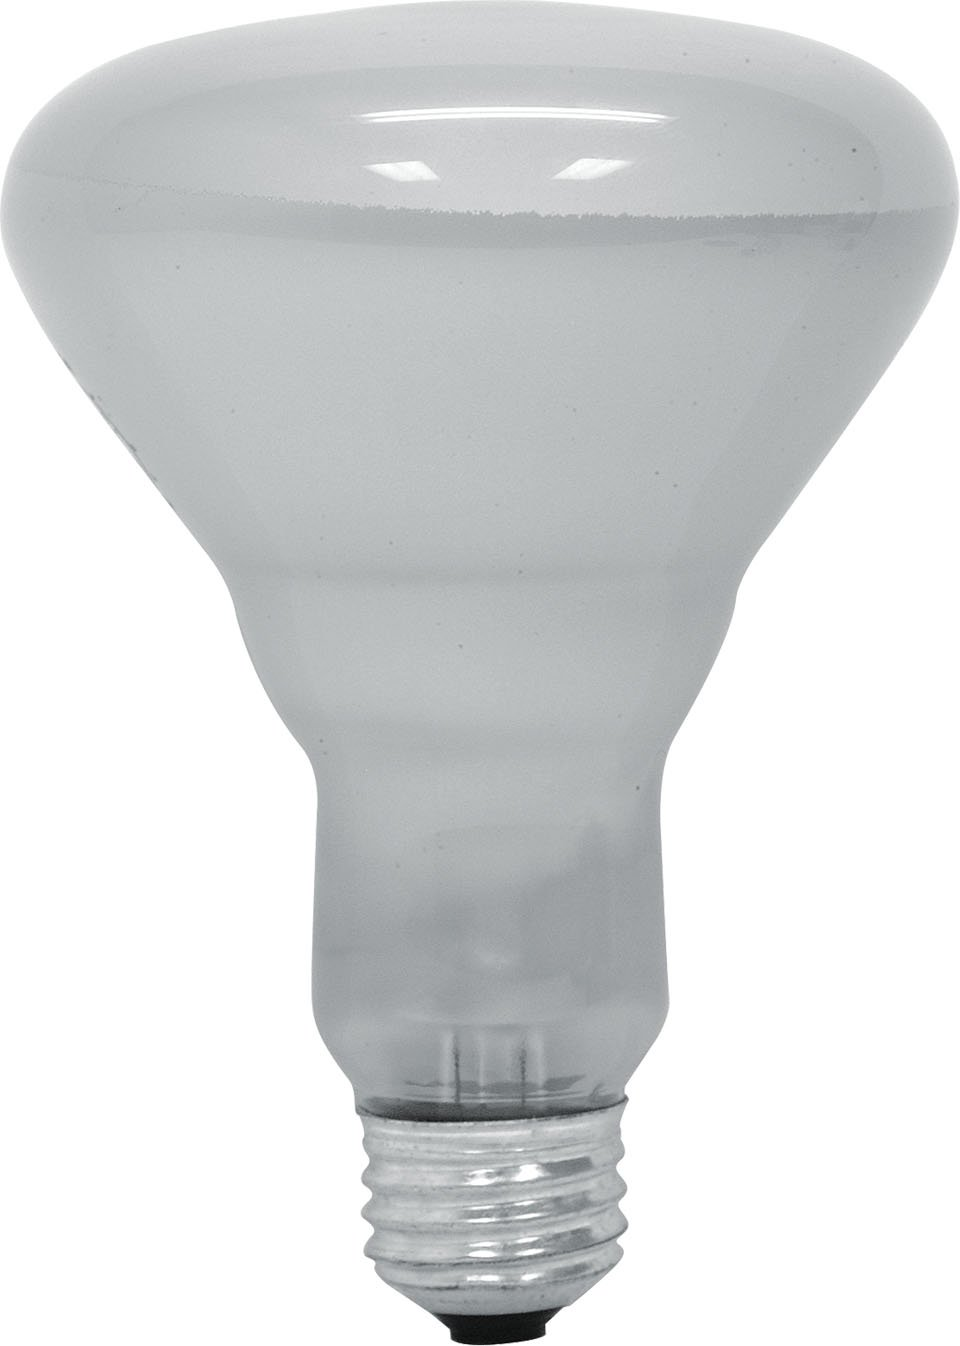 GE Lighting Rough Service Work Light 46859 110-Watt, 1080-Lumen R30 Light Bulb with Medium Base, 6-Pack